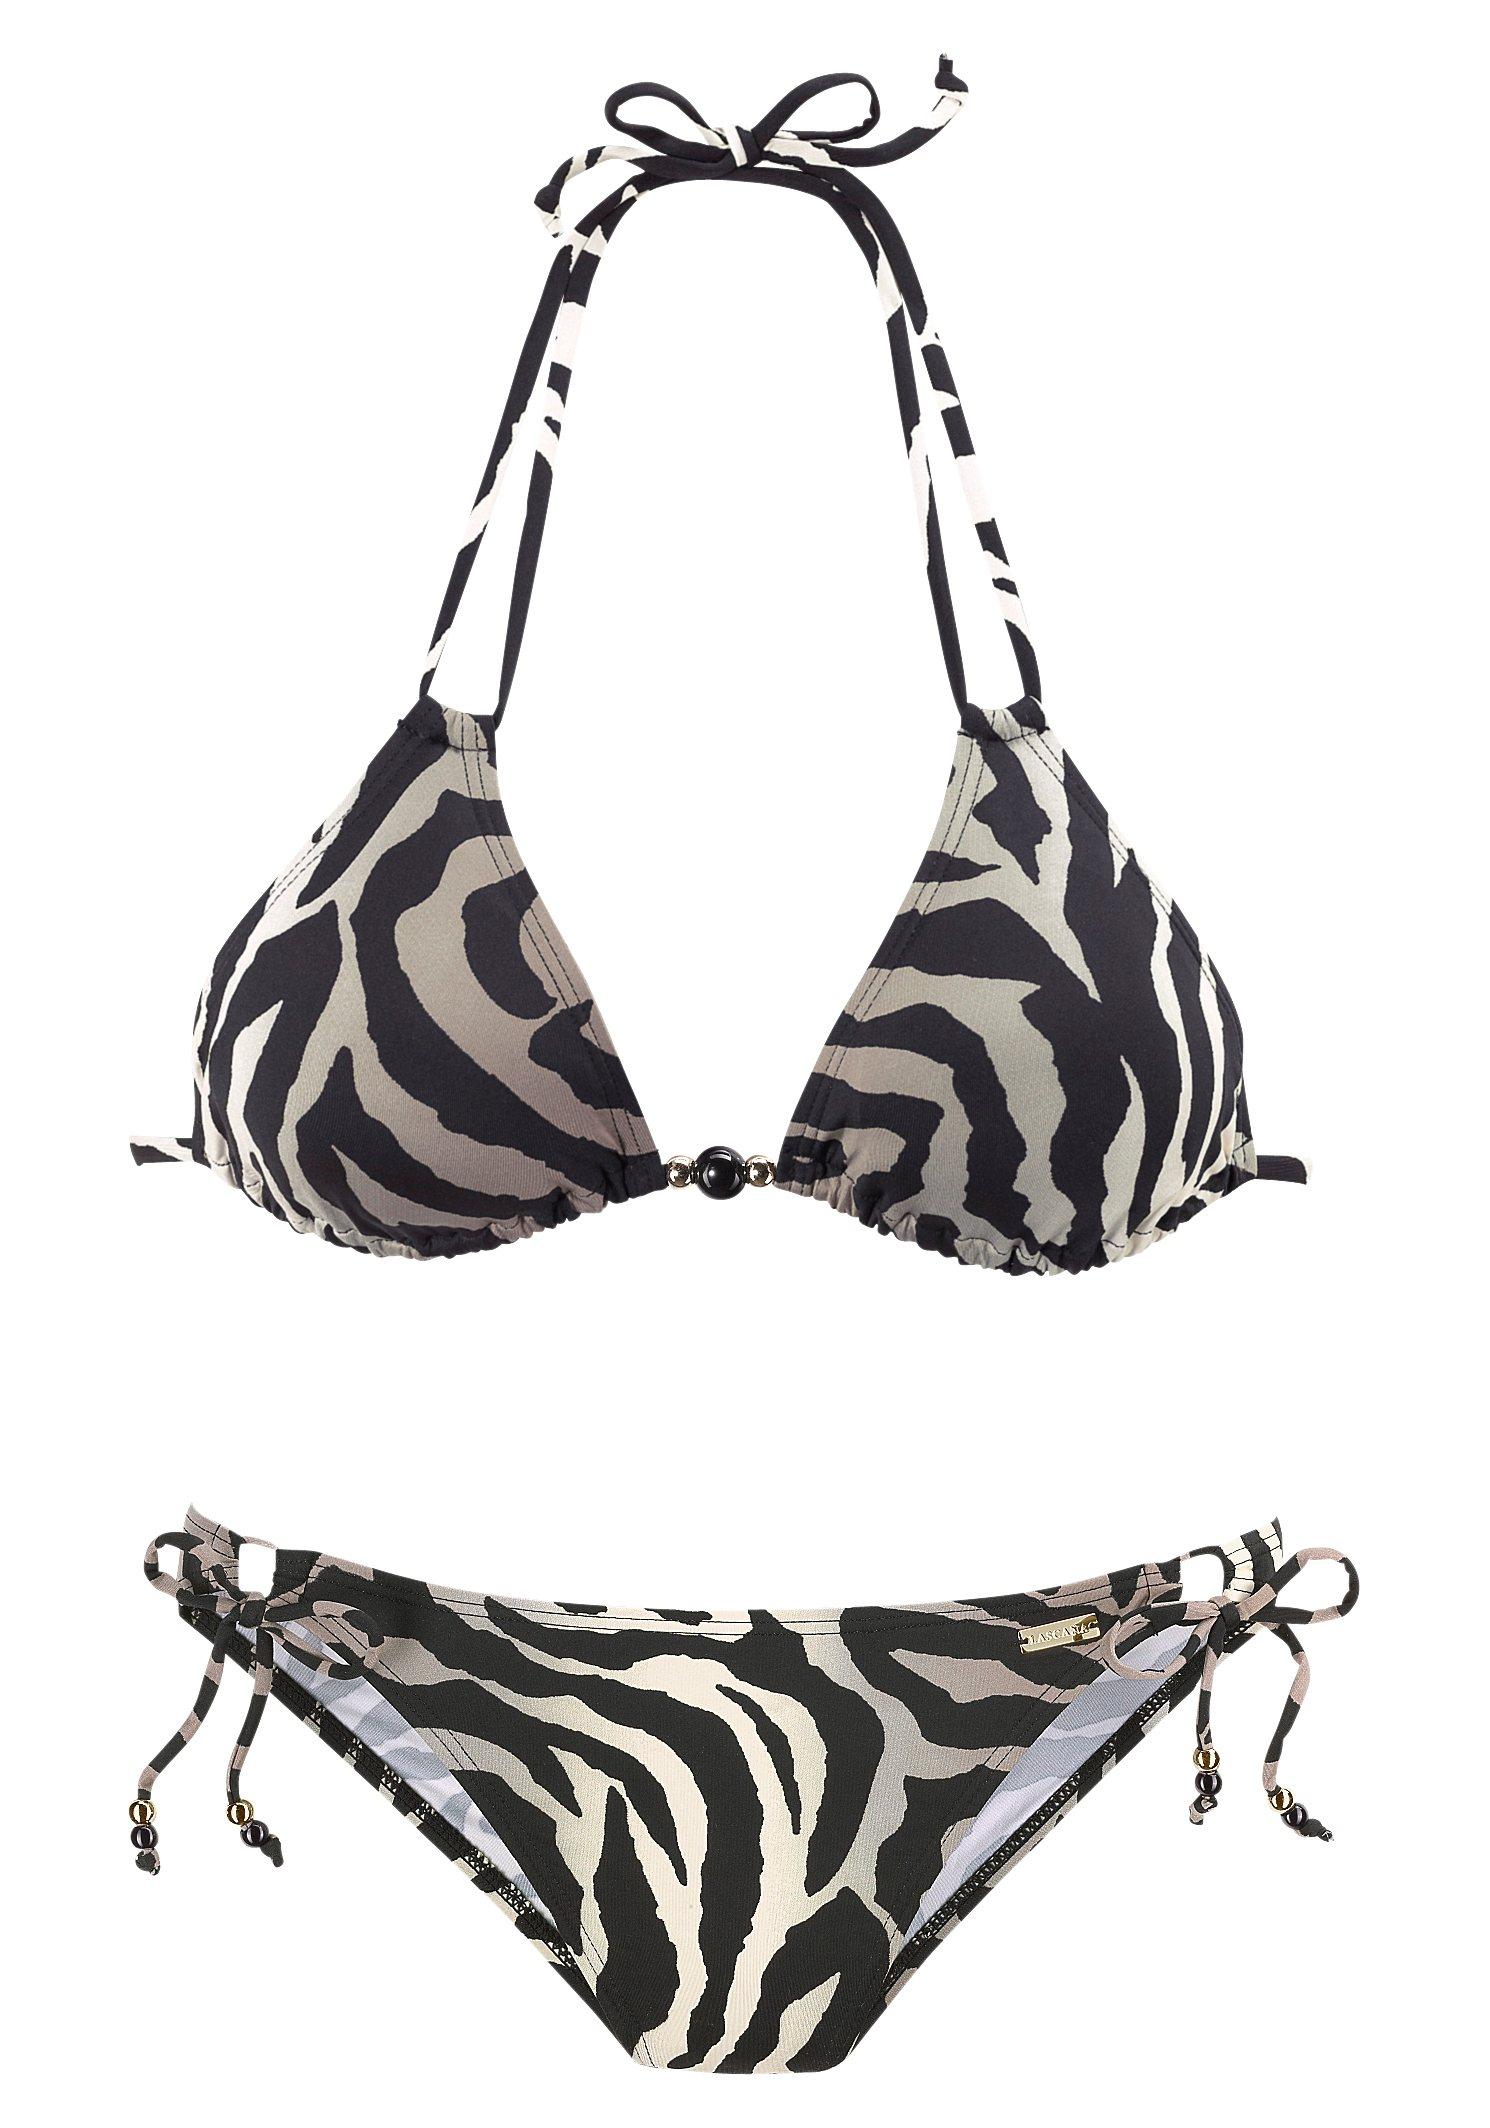 Damen LASCANA Triangel-Bikini im Animalprint schwarz | 04893865362637